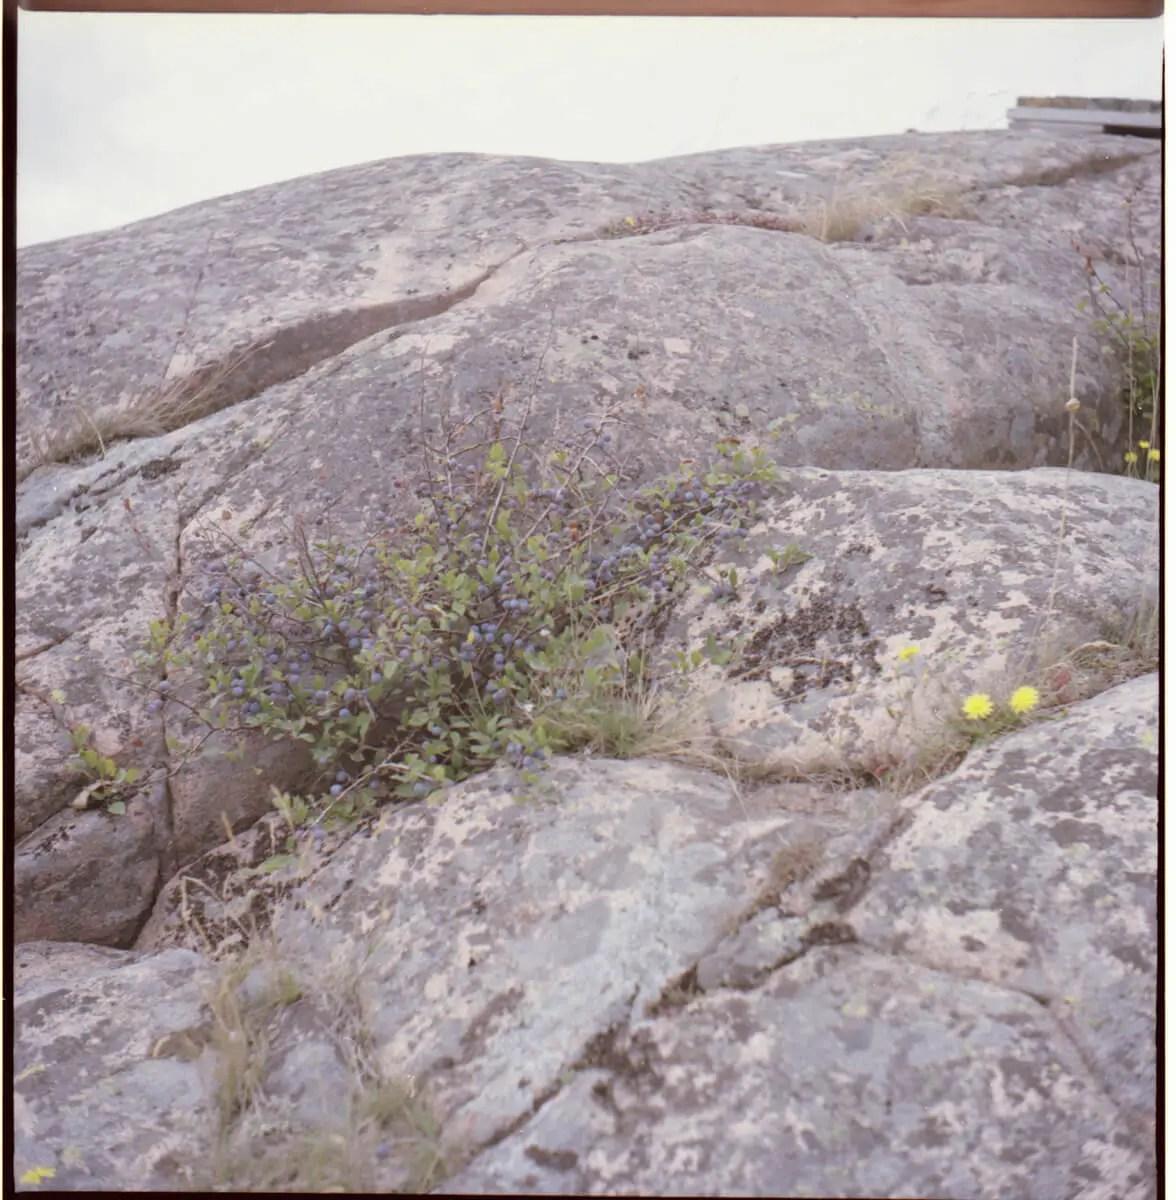 Tobias Eriksson - First roll of 120 film -Kodak Portra 160, Seagull TLR